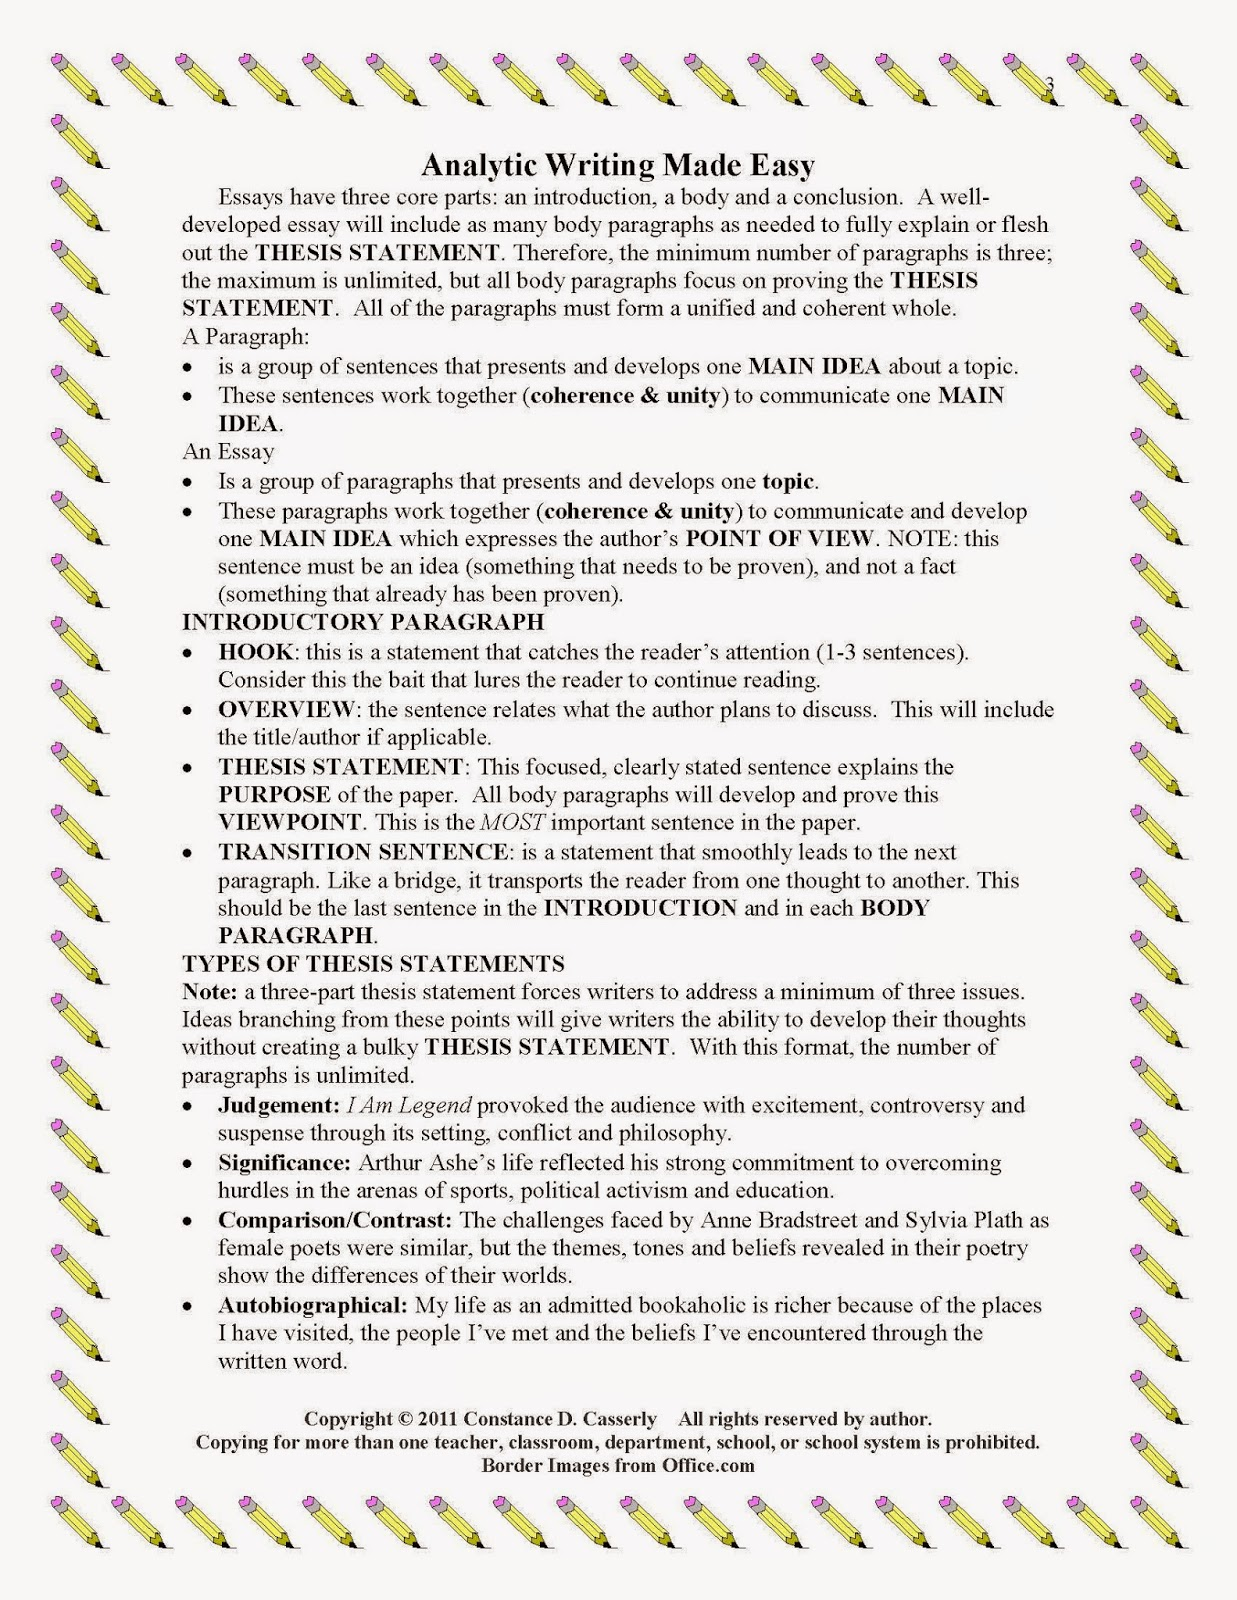 Homework help. Buy custom written Literature essay. | MCTS Windows ...